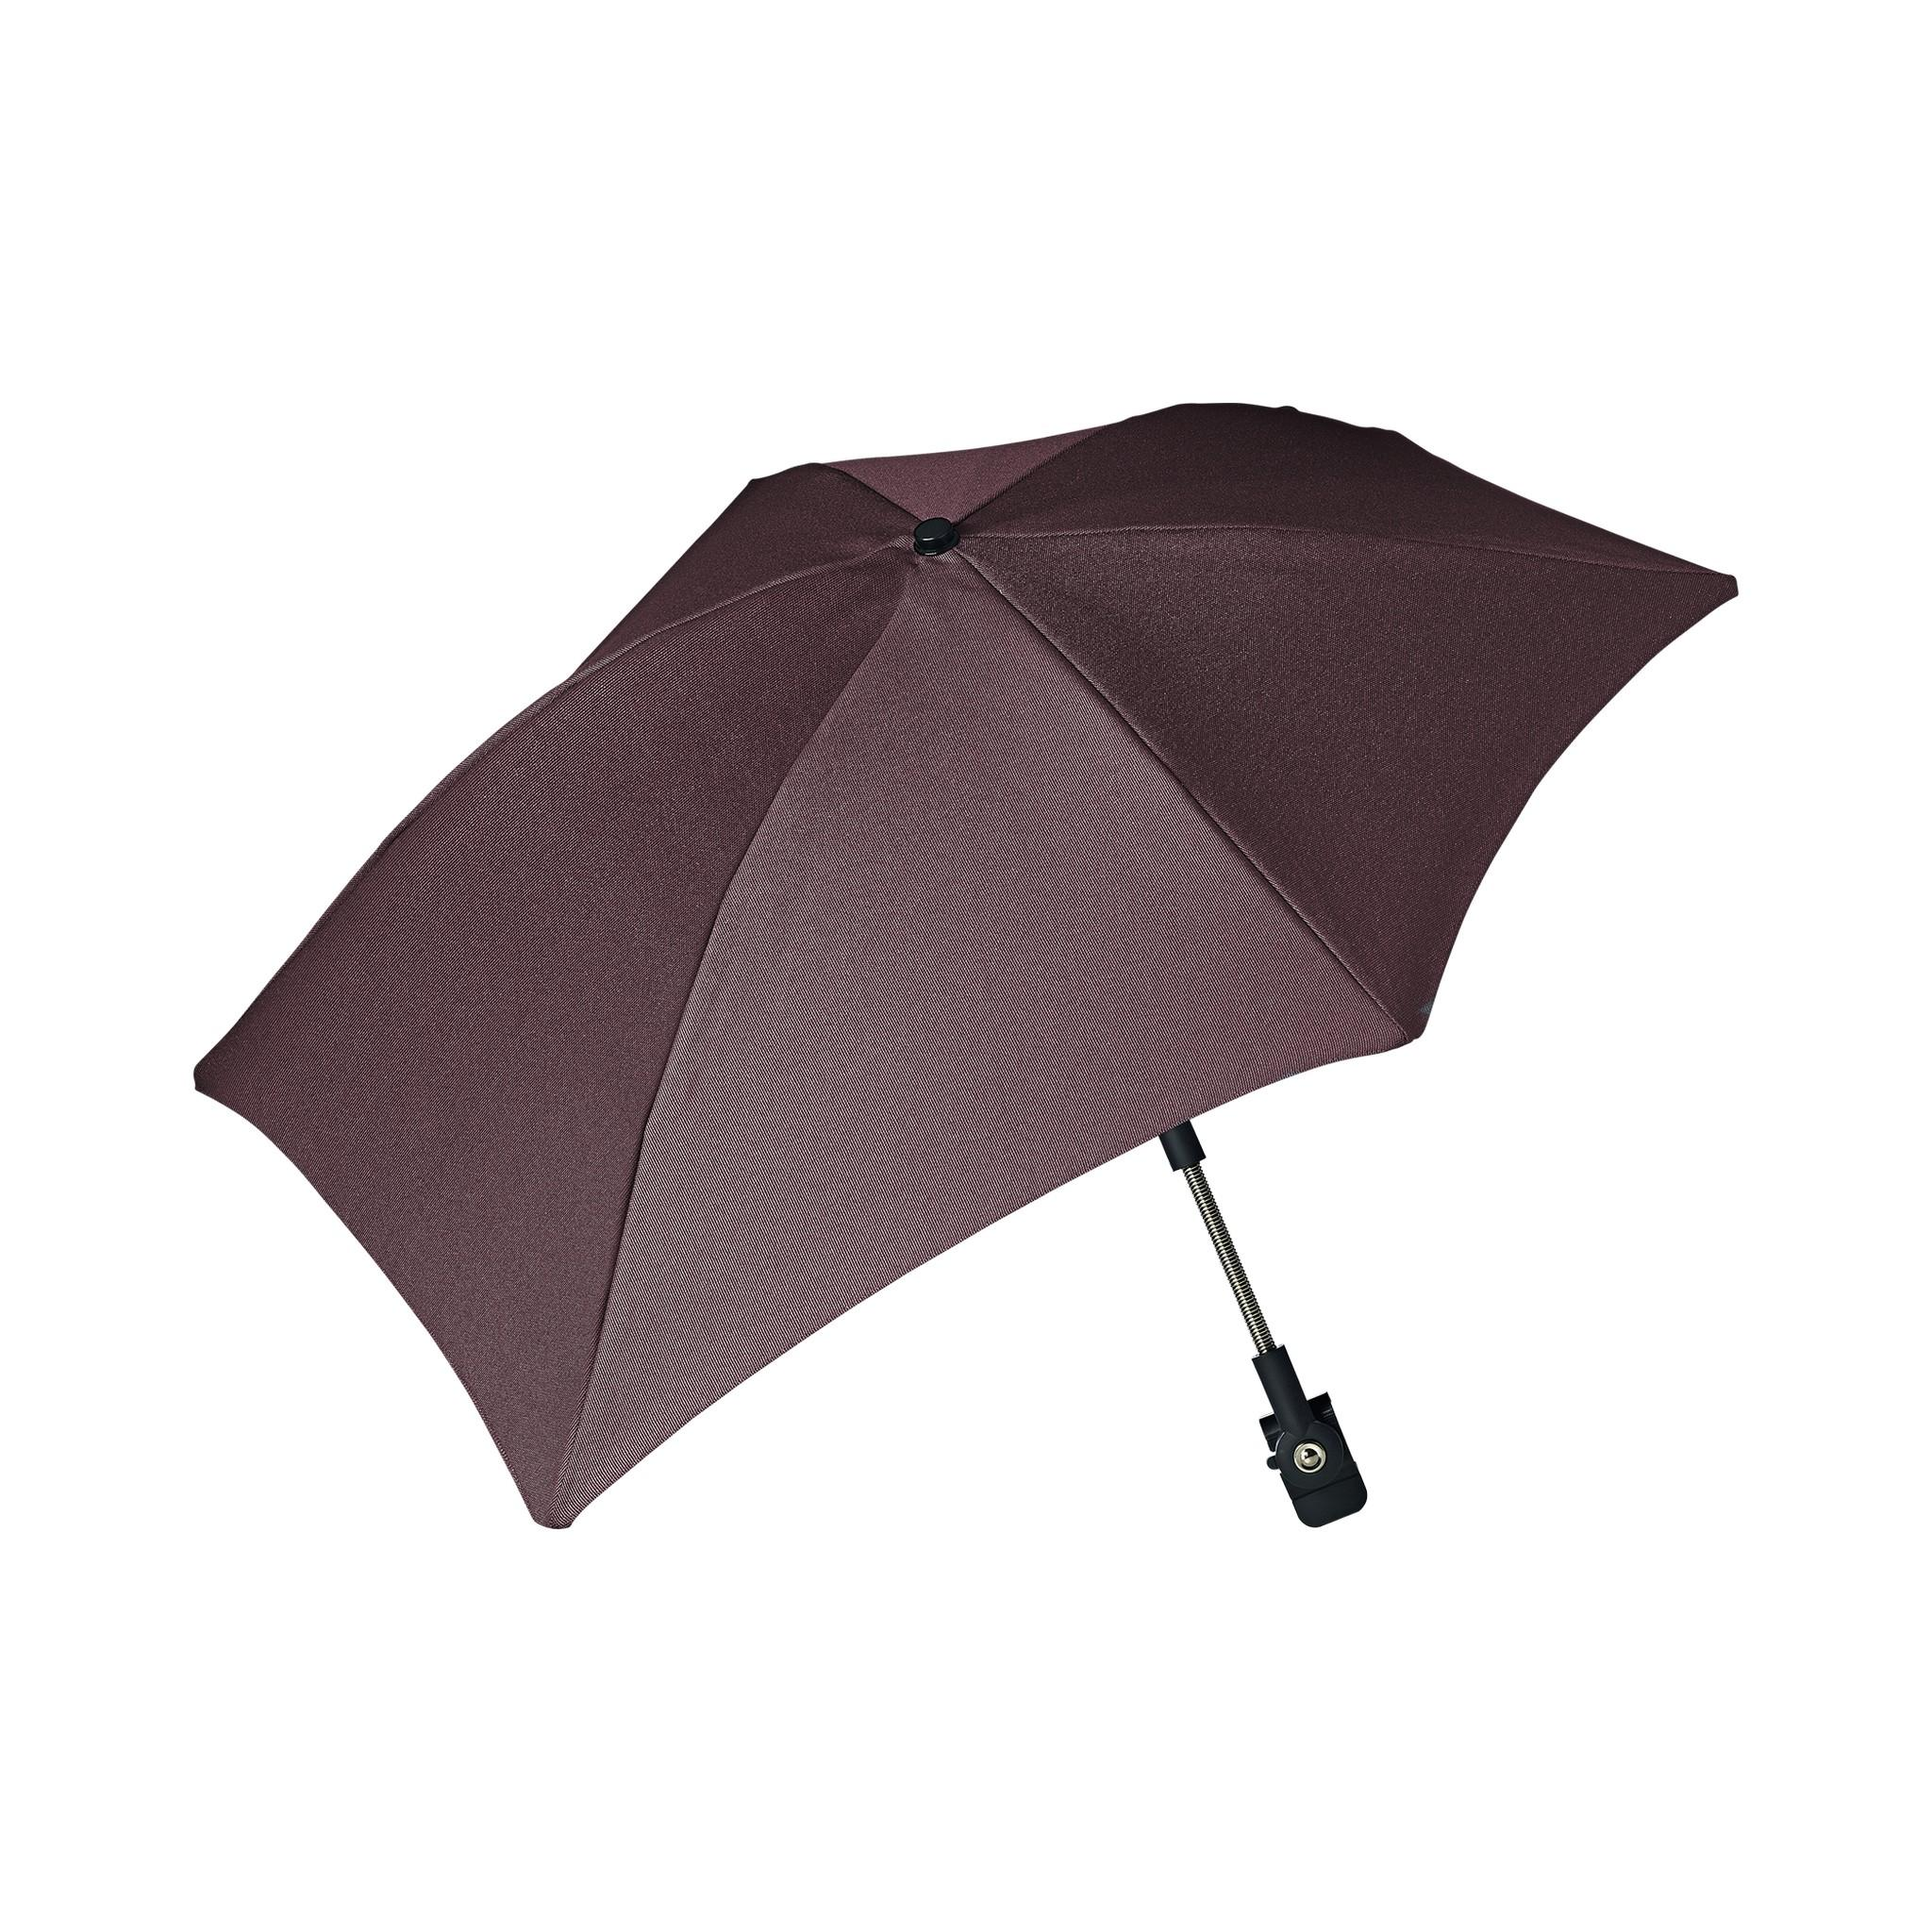 Joolz - Day/Geo parasol - Epic maroon